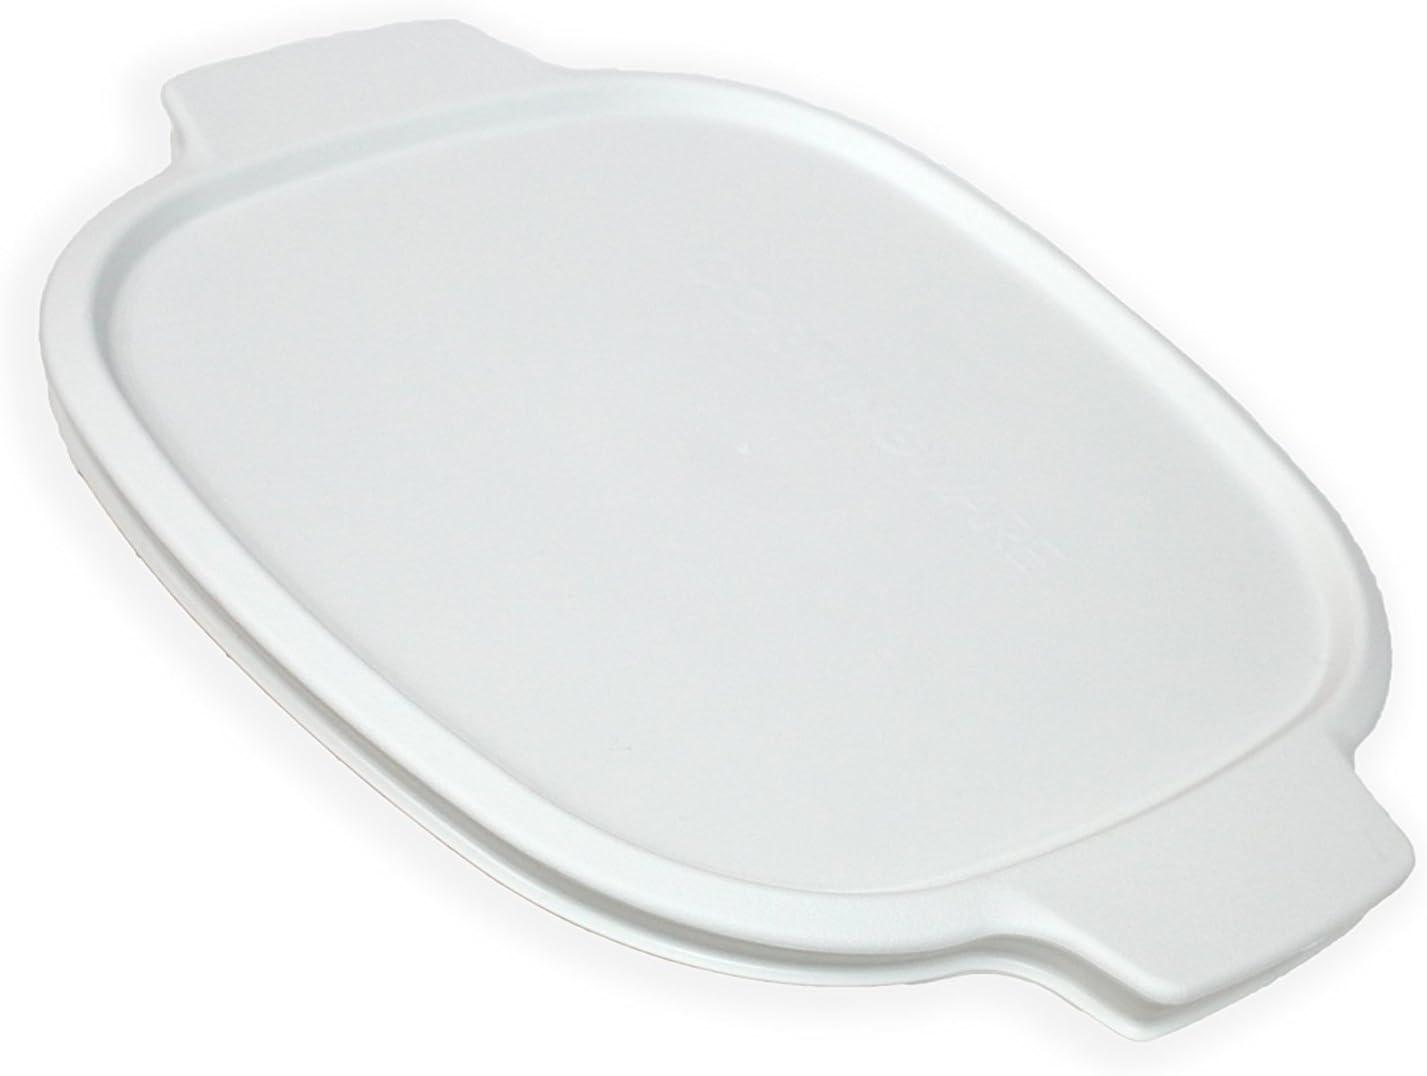 CORNINGWARE StoveTop 2-qt / 3-qt White Plastic Cover (fits Corningware A-2)